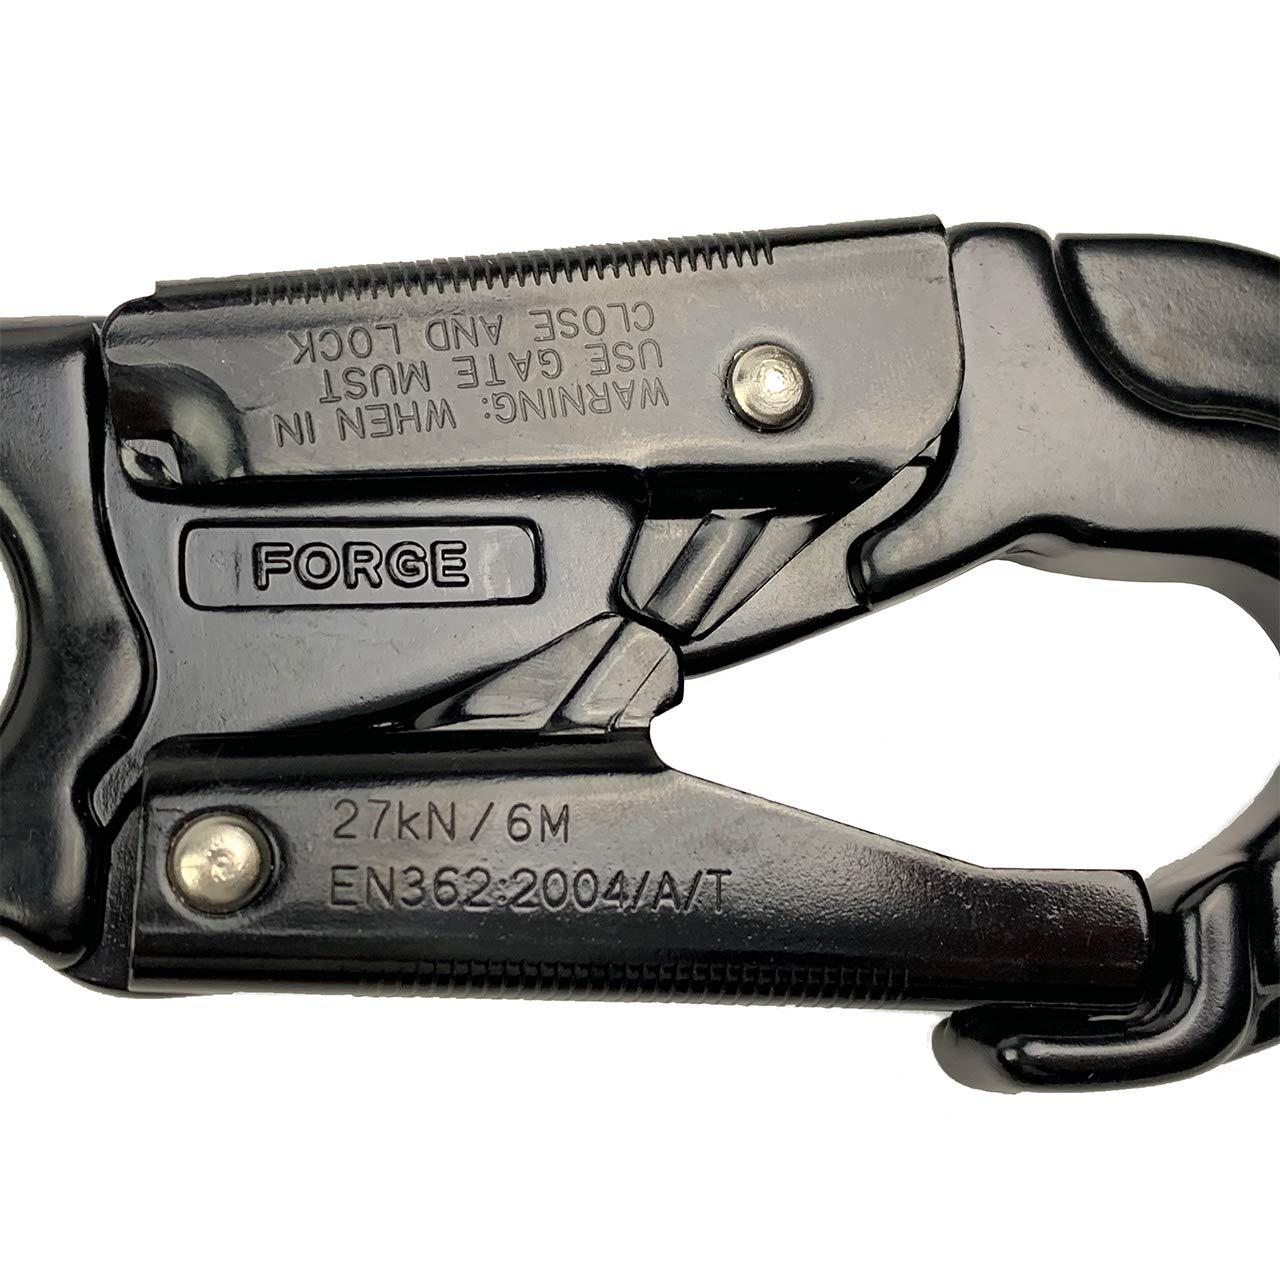 ProClimb Forged Aluminum Snaphook Blue Double Action Self Locking Gate Captive Eye 23 kN